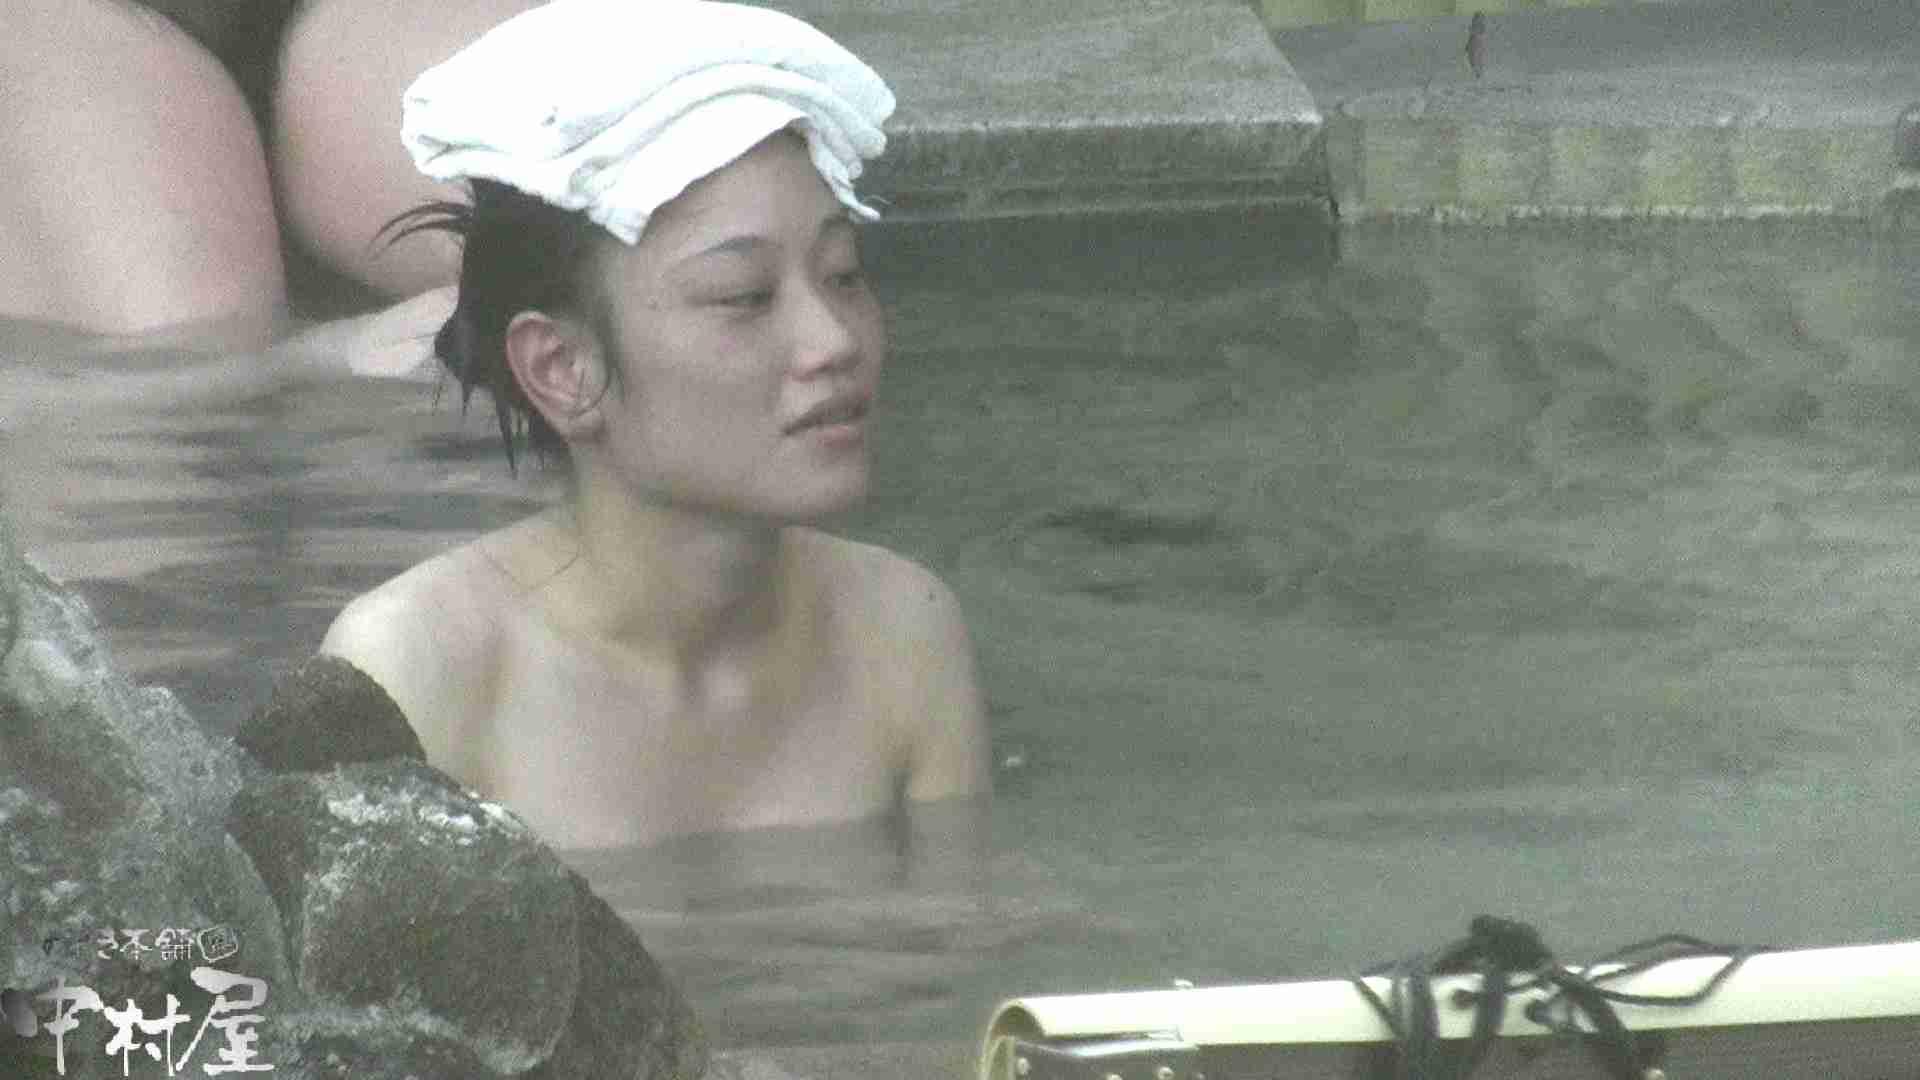 Aquaな露天風呂Vol.914 露天風呂編  83PIX 50